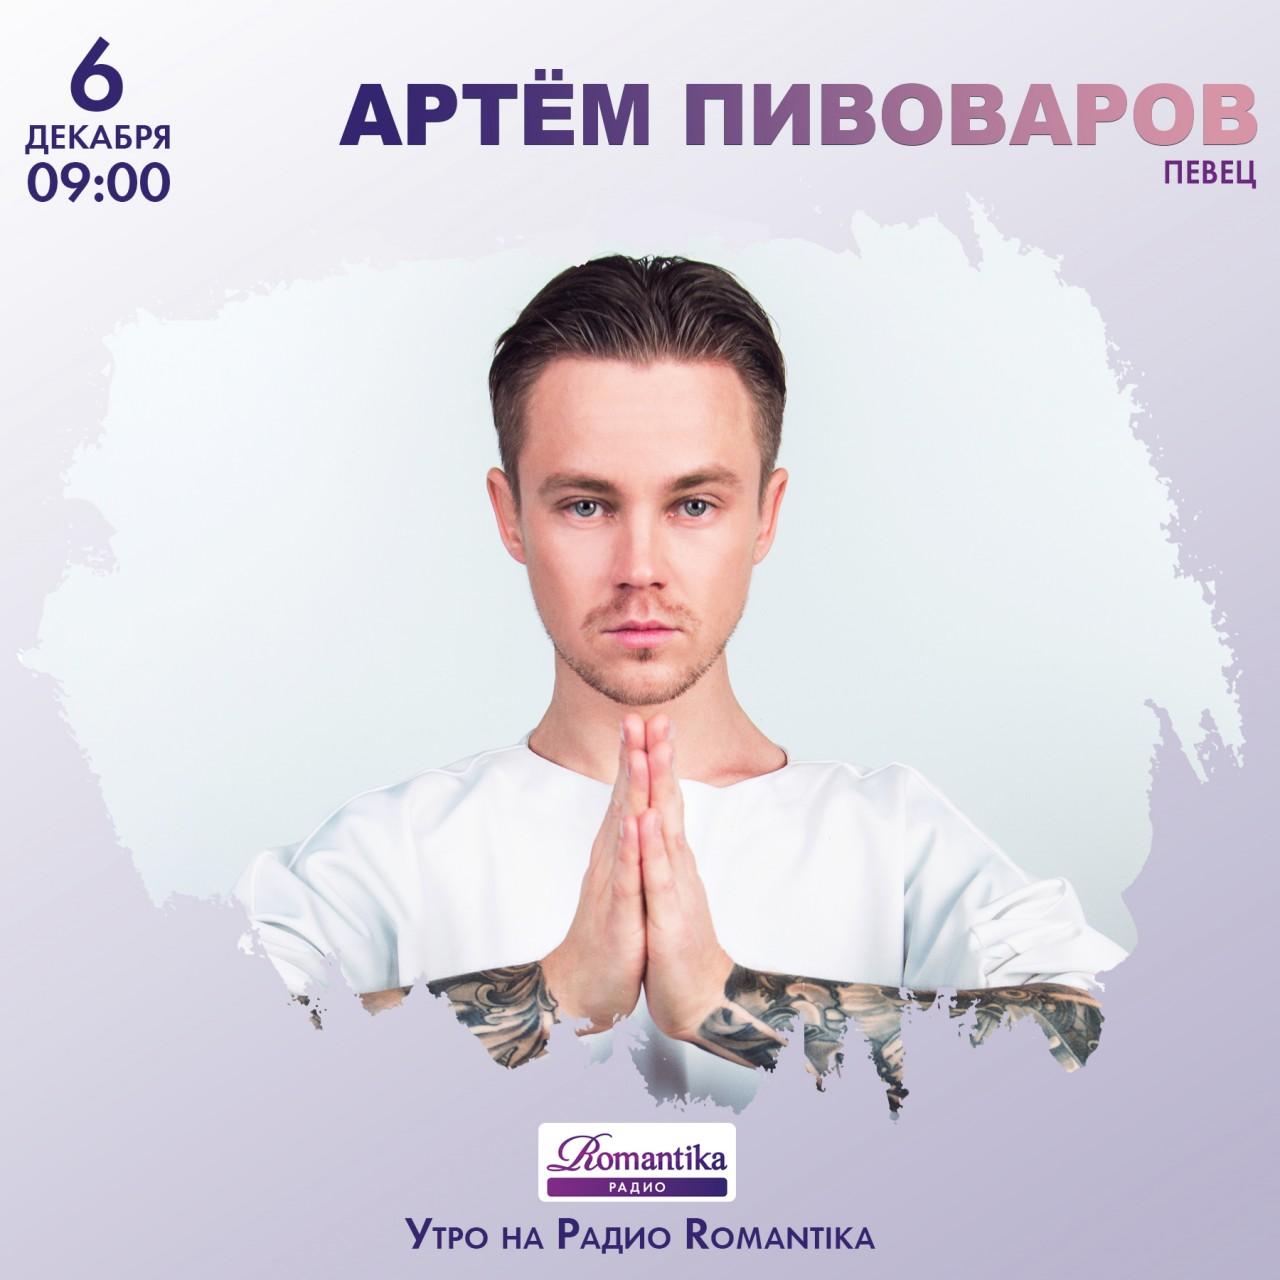 Радио Romantika: 6 декабря –…